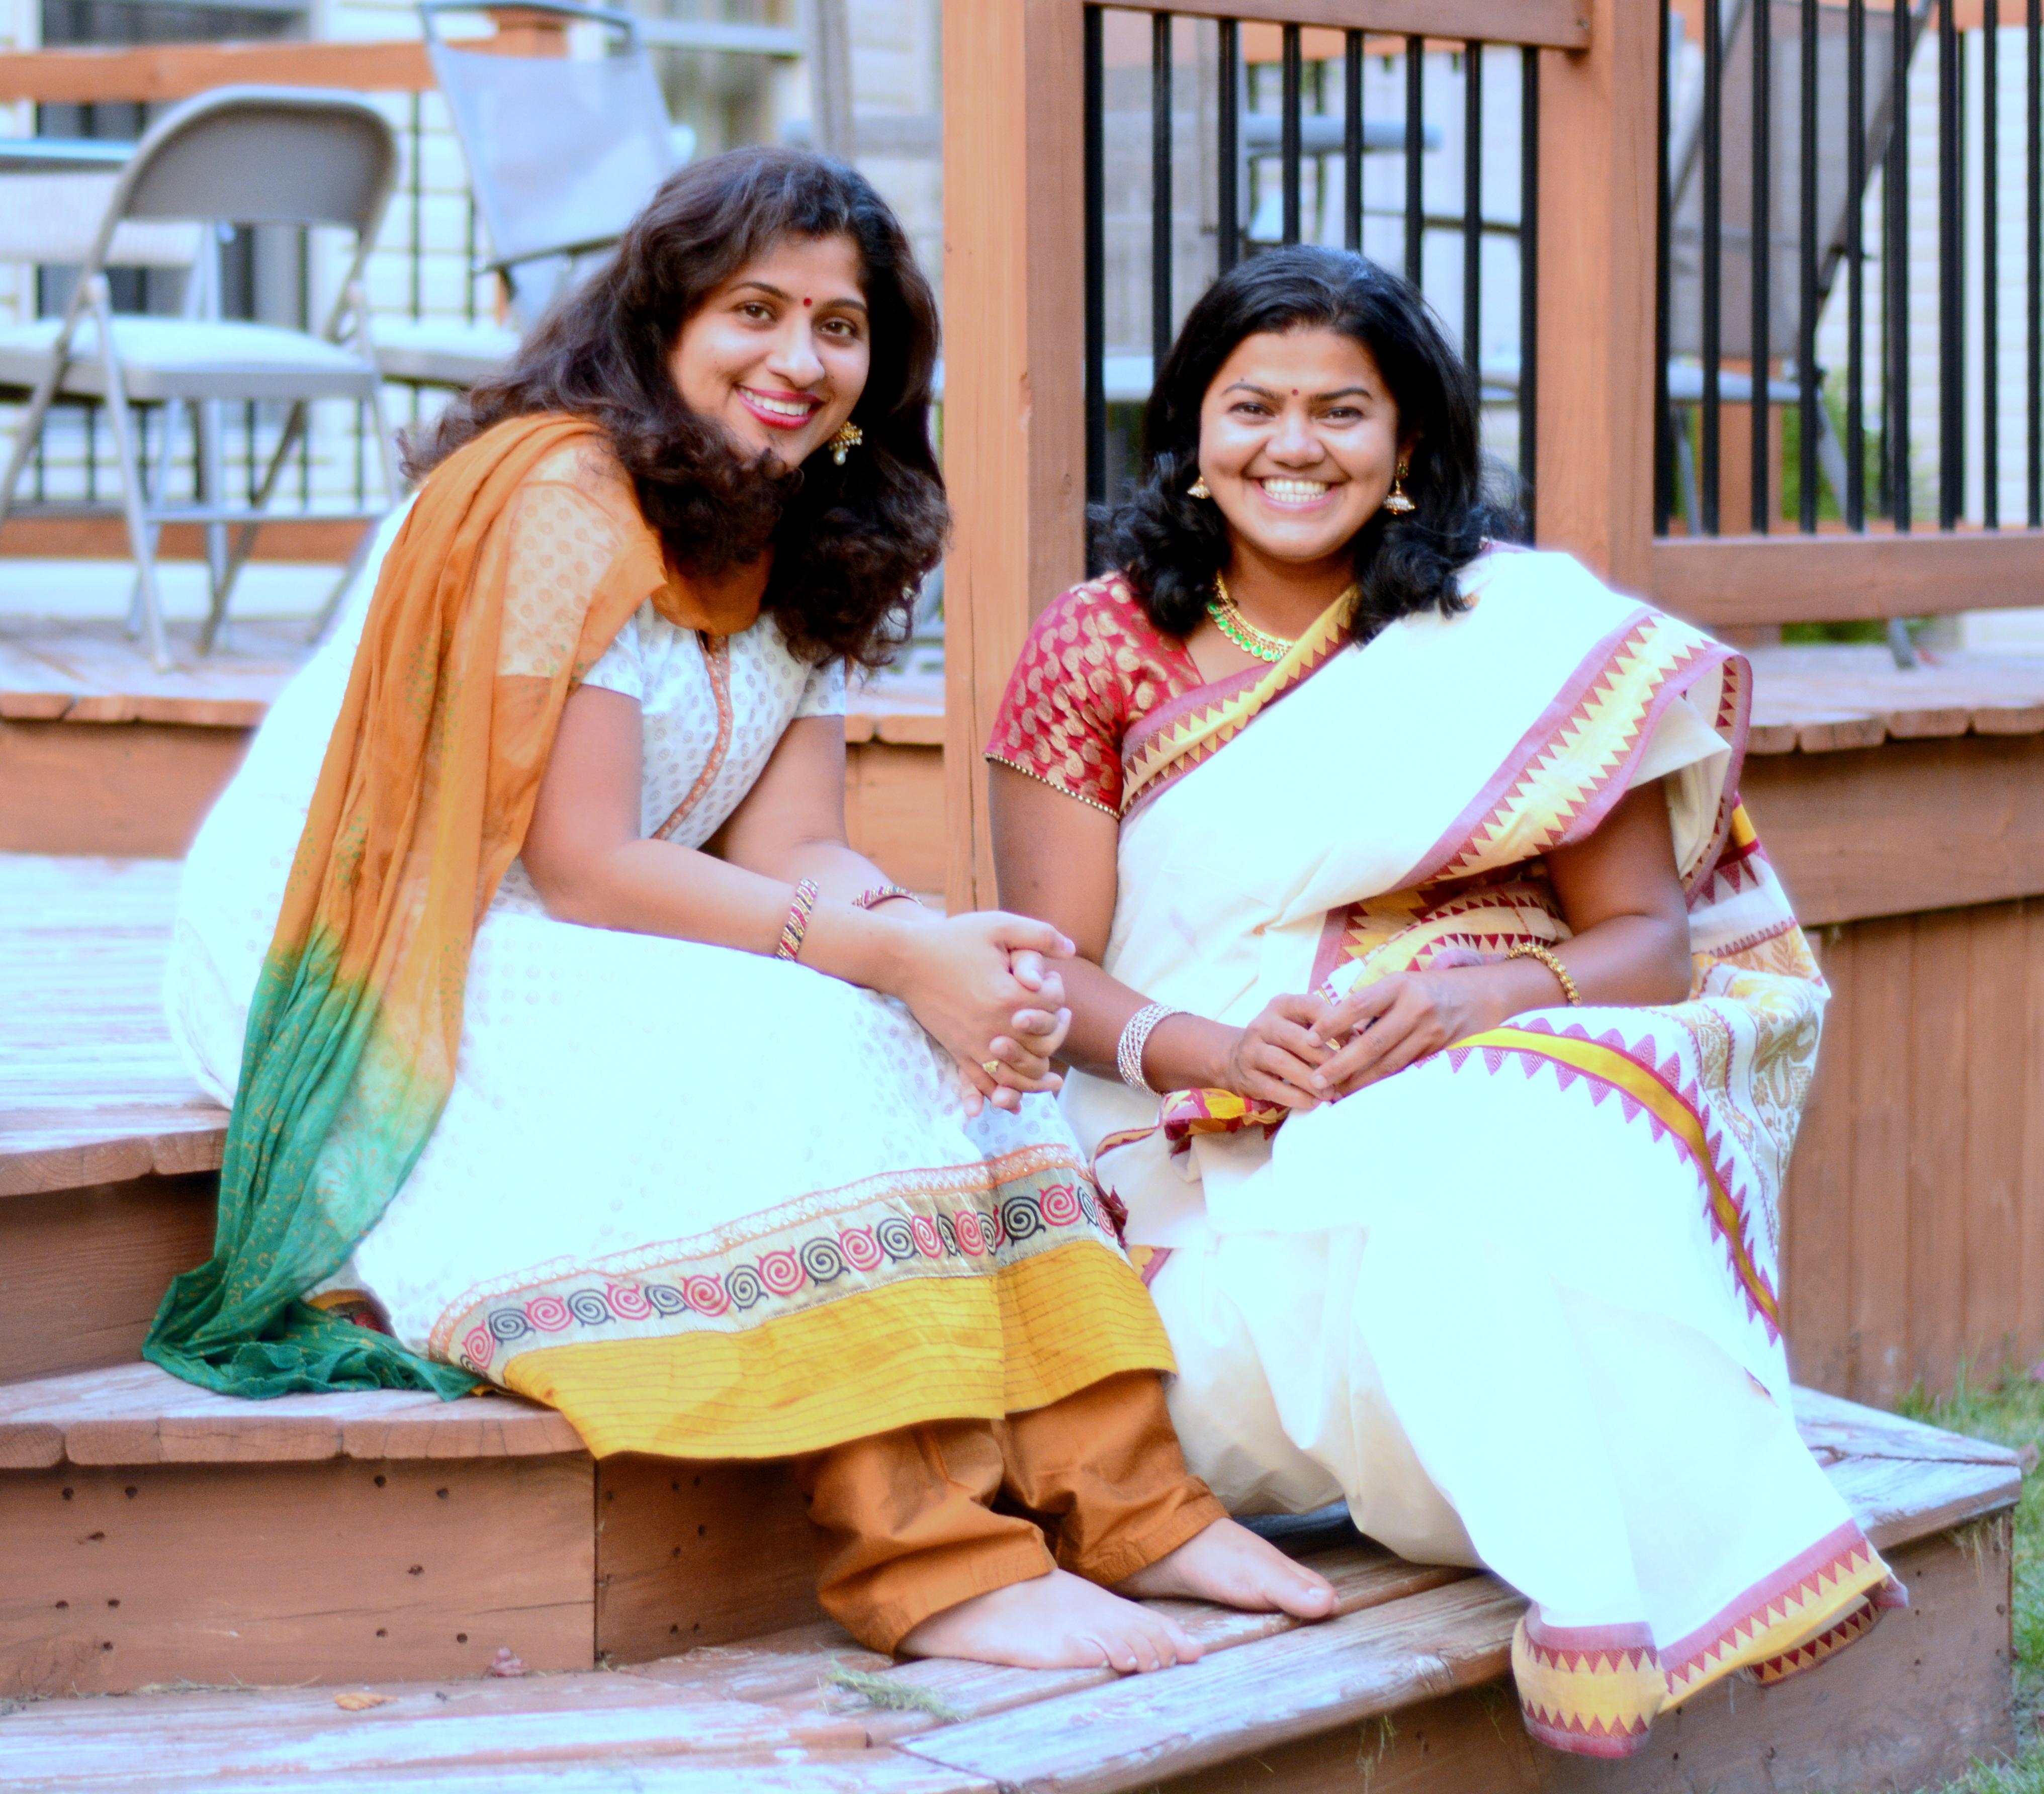 Namitha and Lakshmy